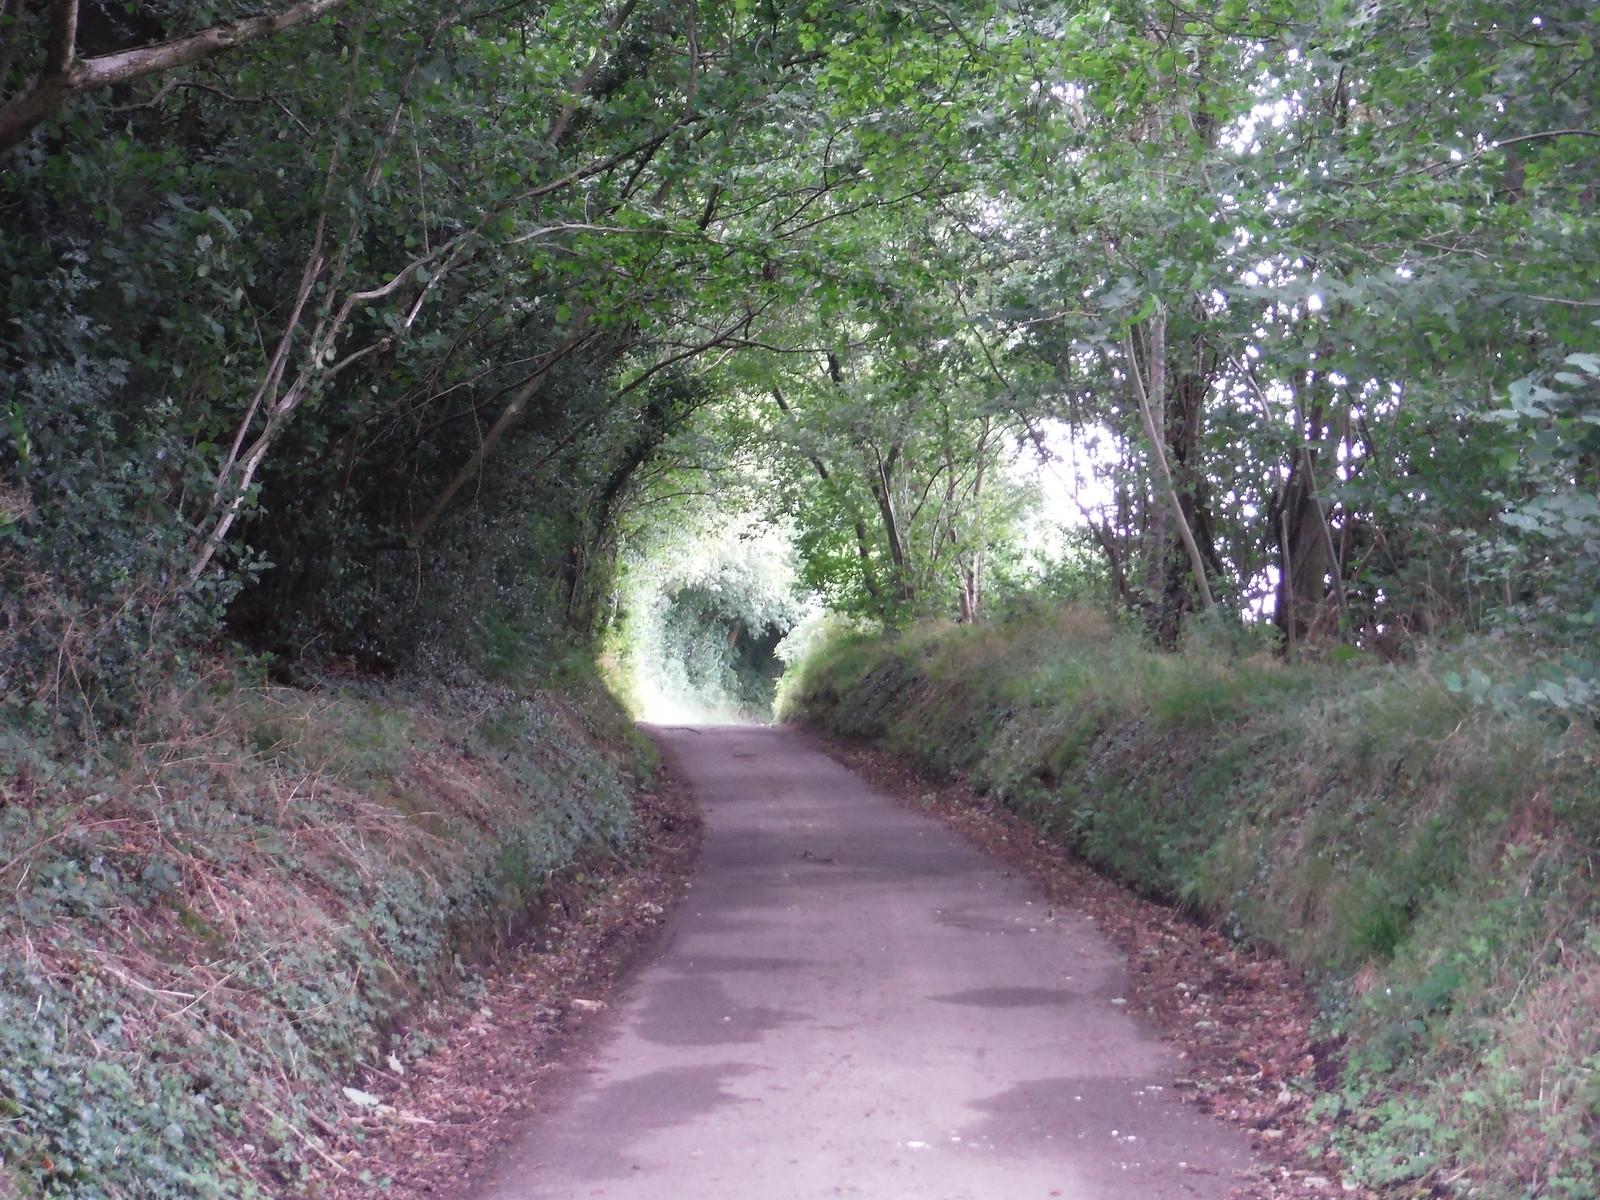 Pigtrough Lane, a typical bit of road walking SWC Walk 252 Tisbury Circular via Donhead St. Andrew